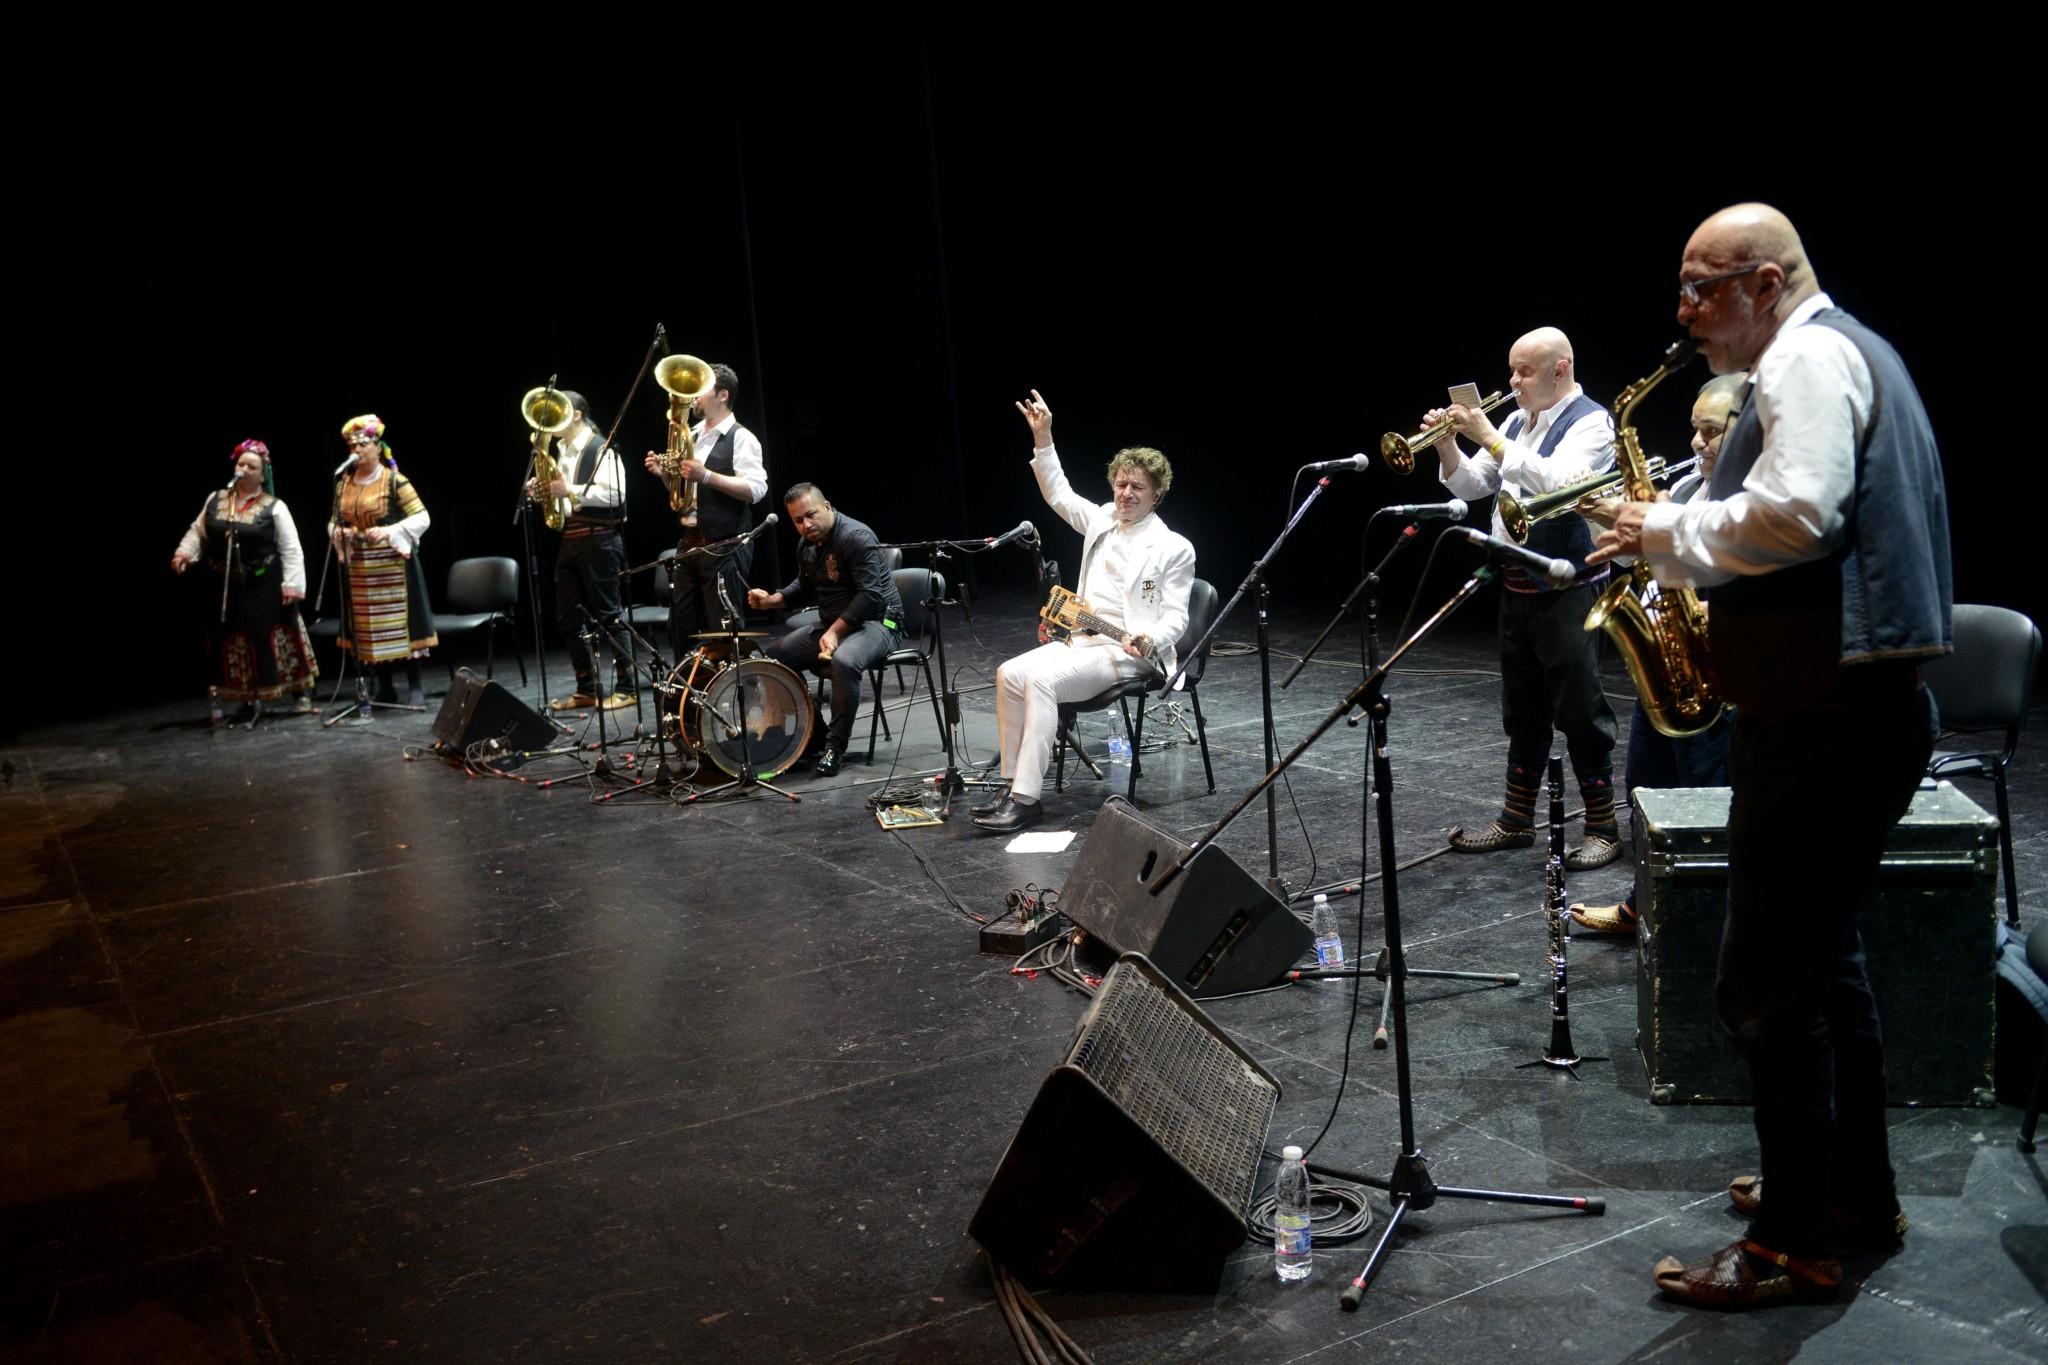 Balkan Superstar Goran Bregović Ignites the Chan Centre with Big Brass Band in Exhilarating Performance